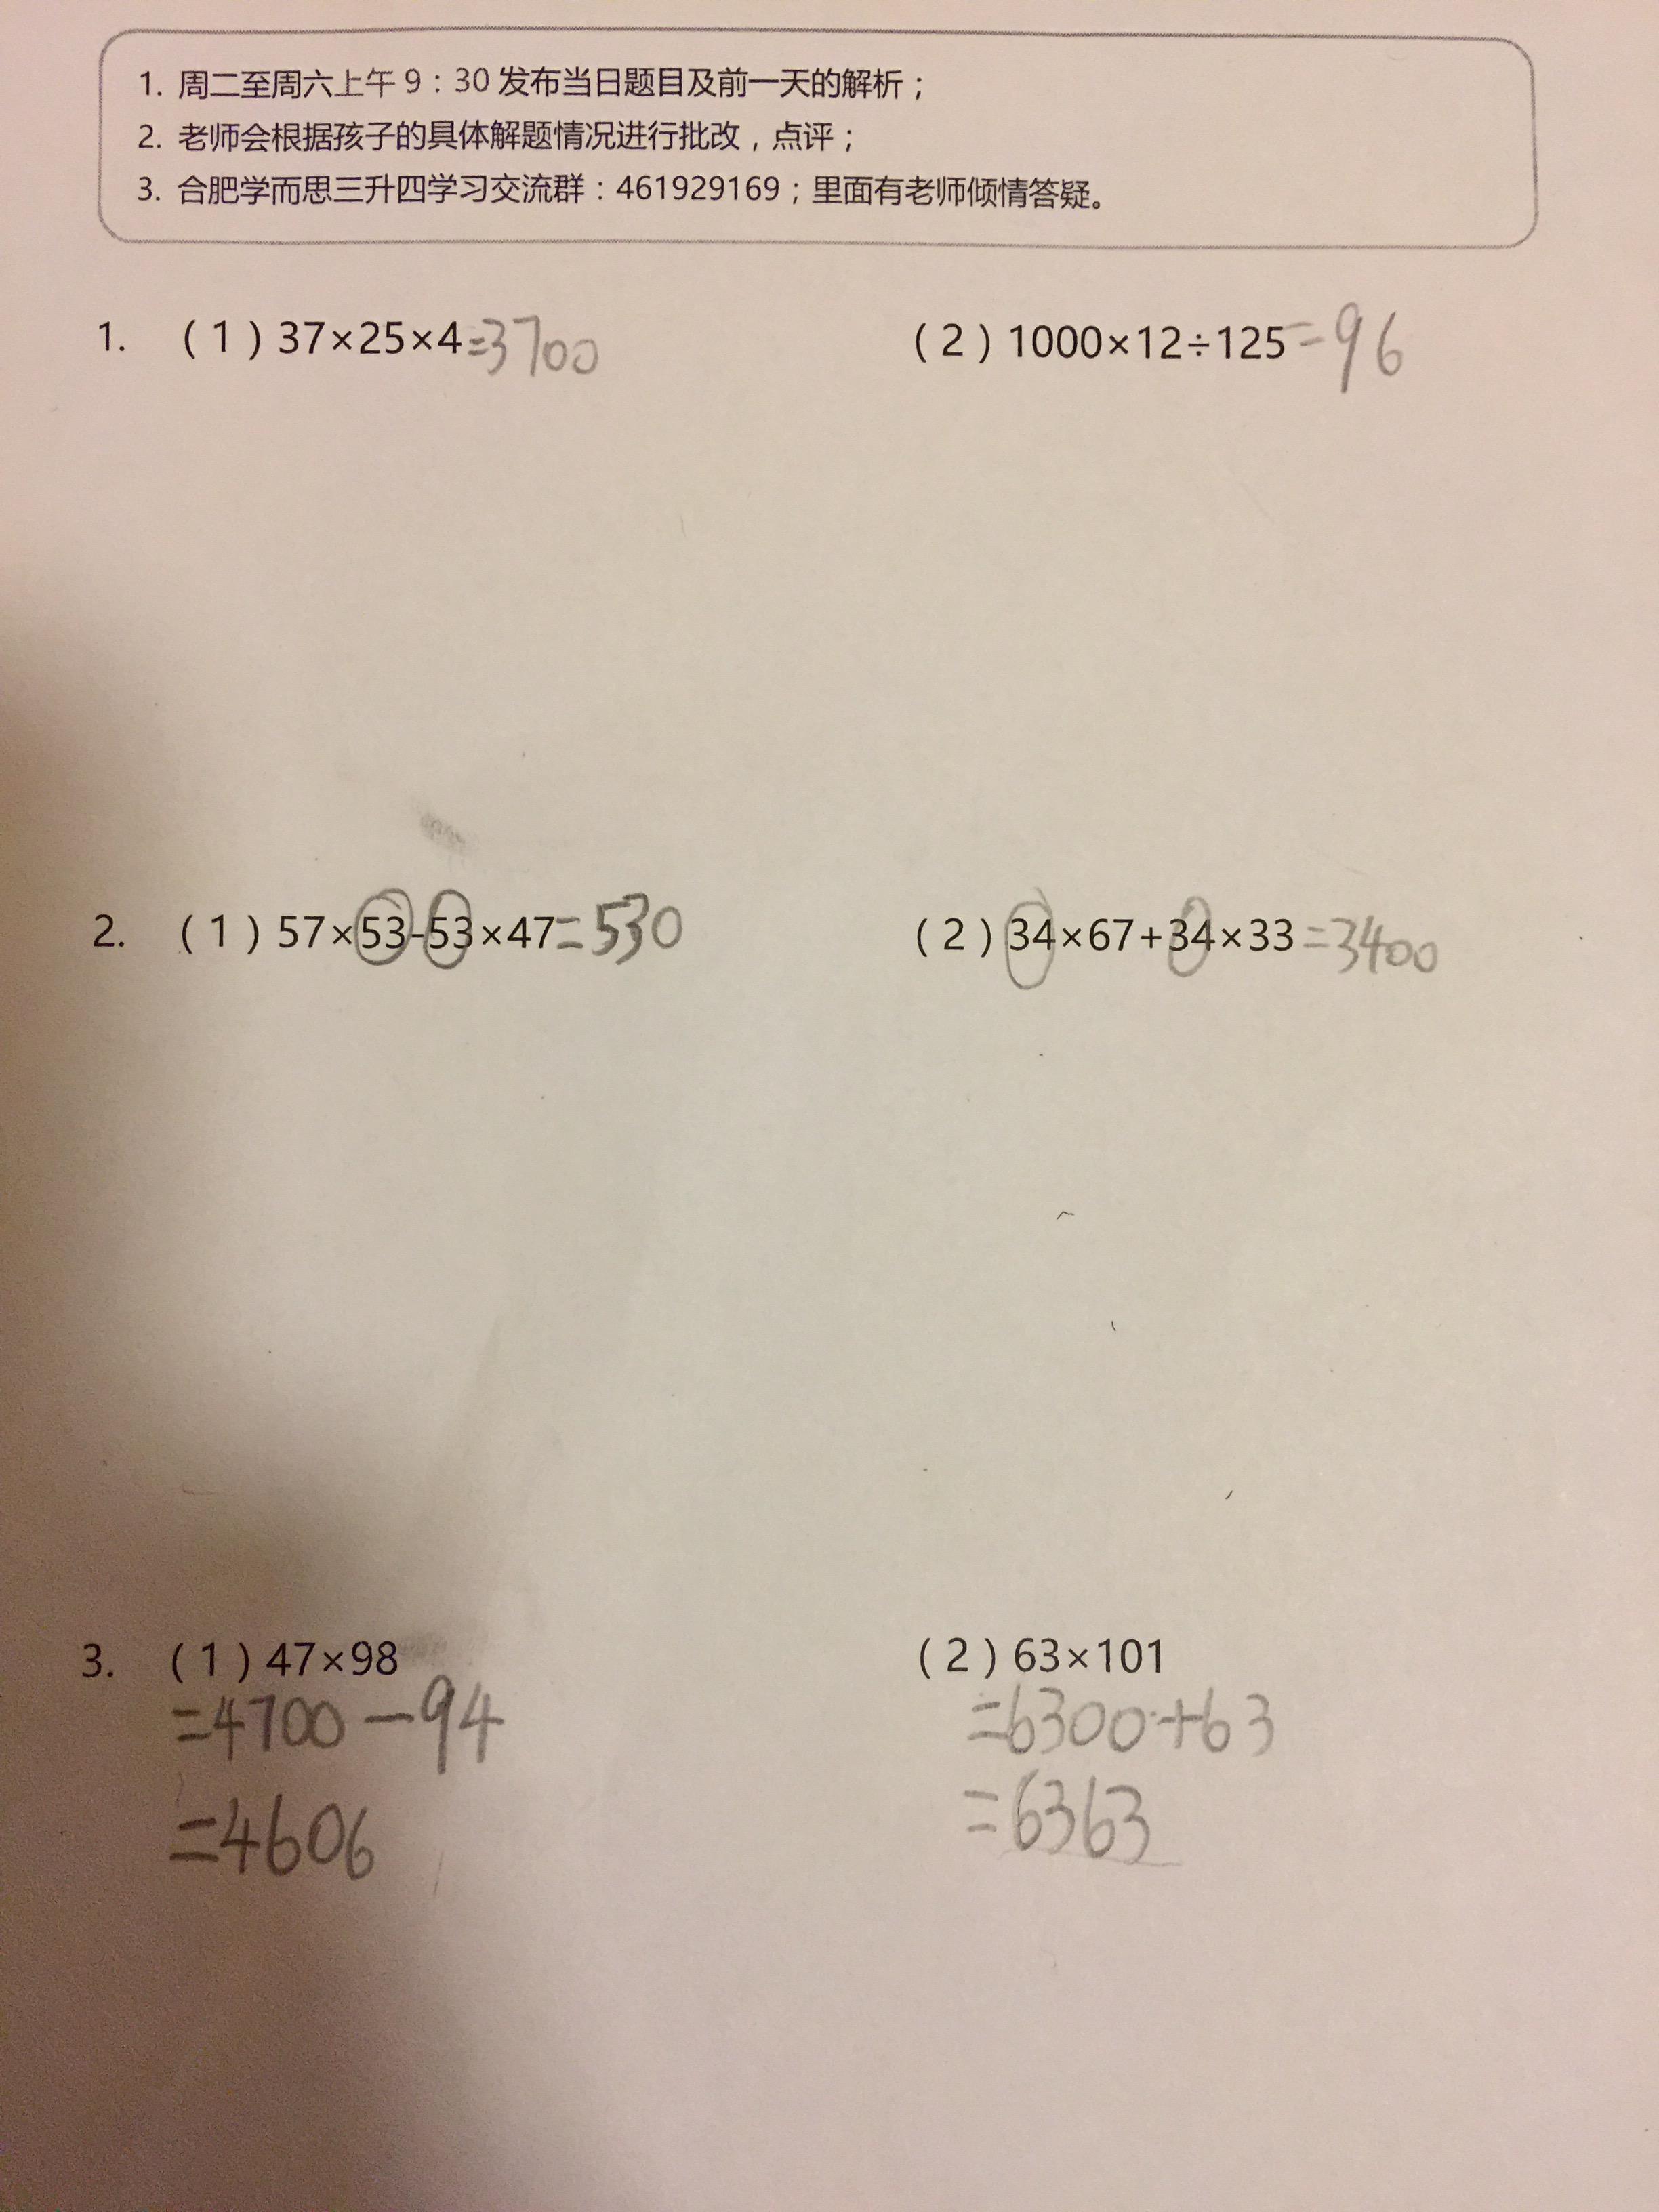 6B4DEDA8-C09D-4C54-B84B-76A7289FCB80.jpg